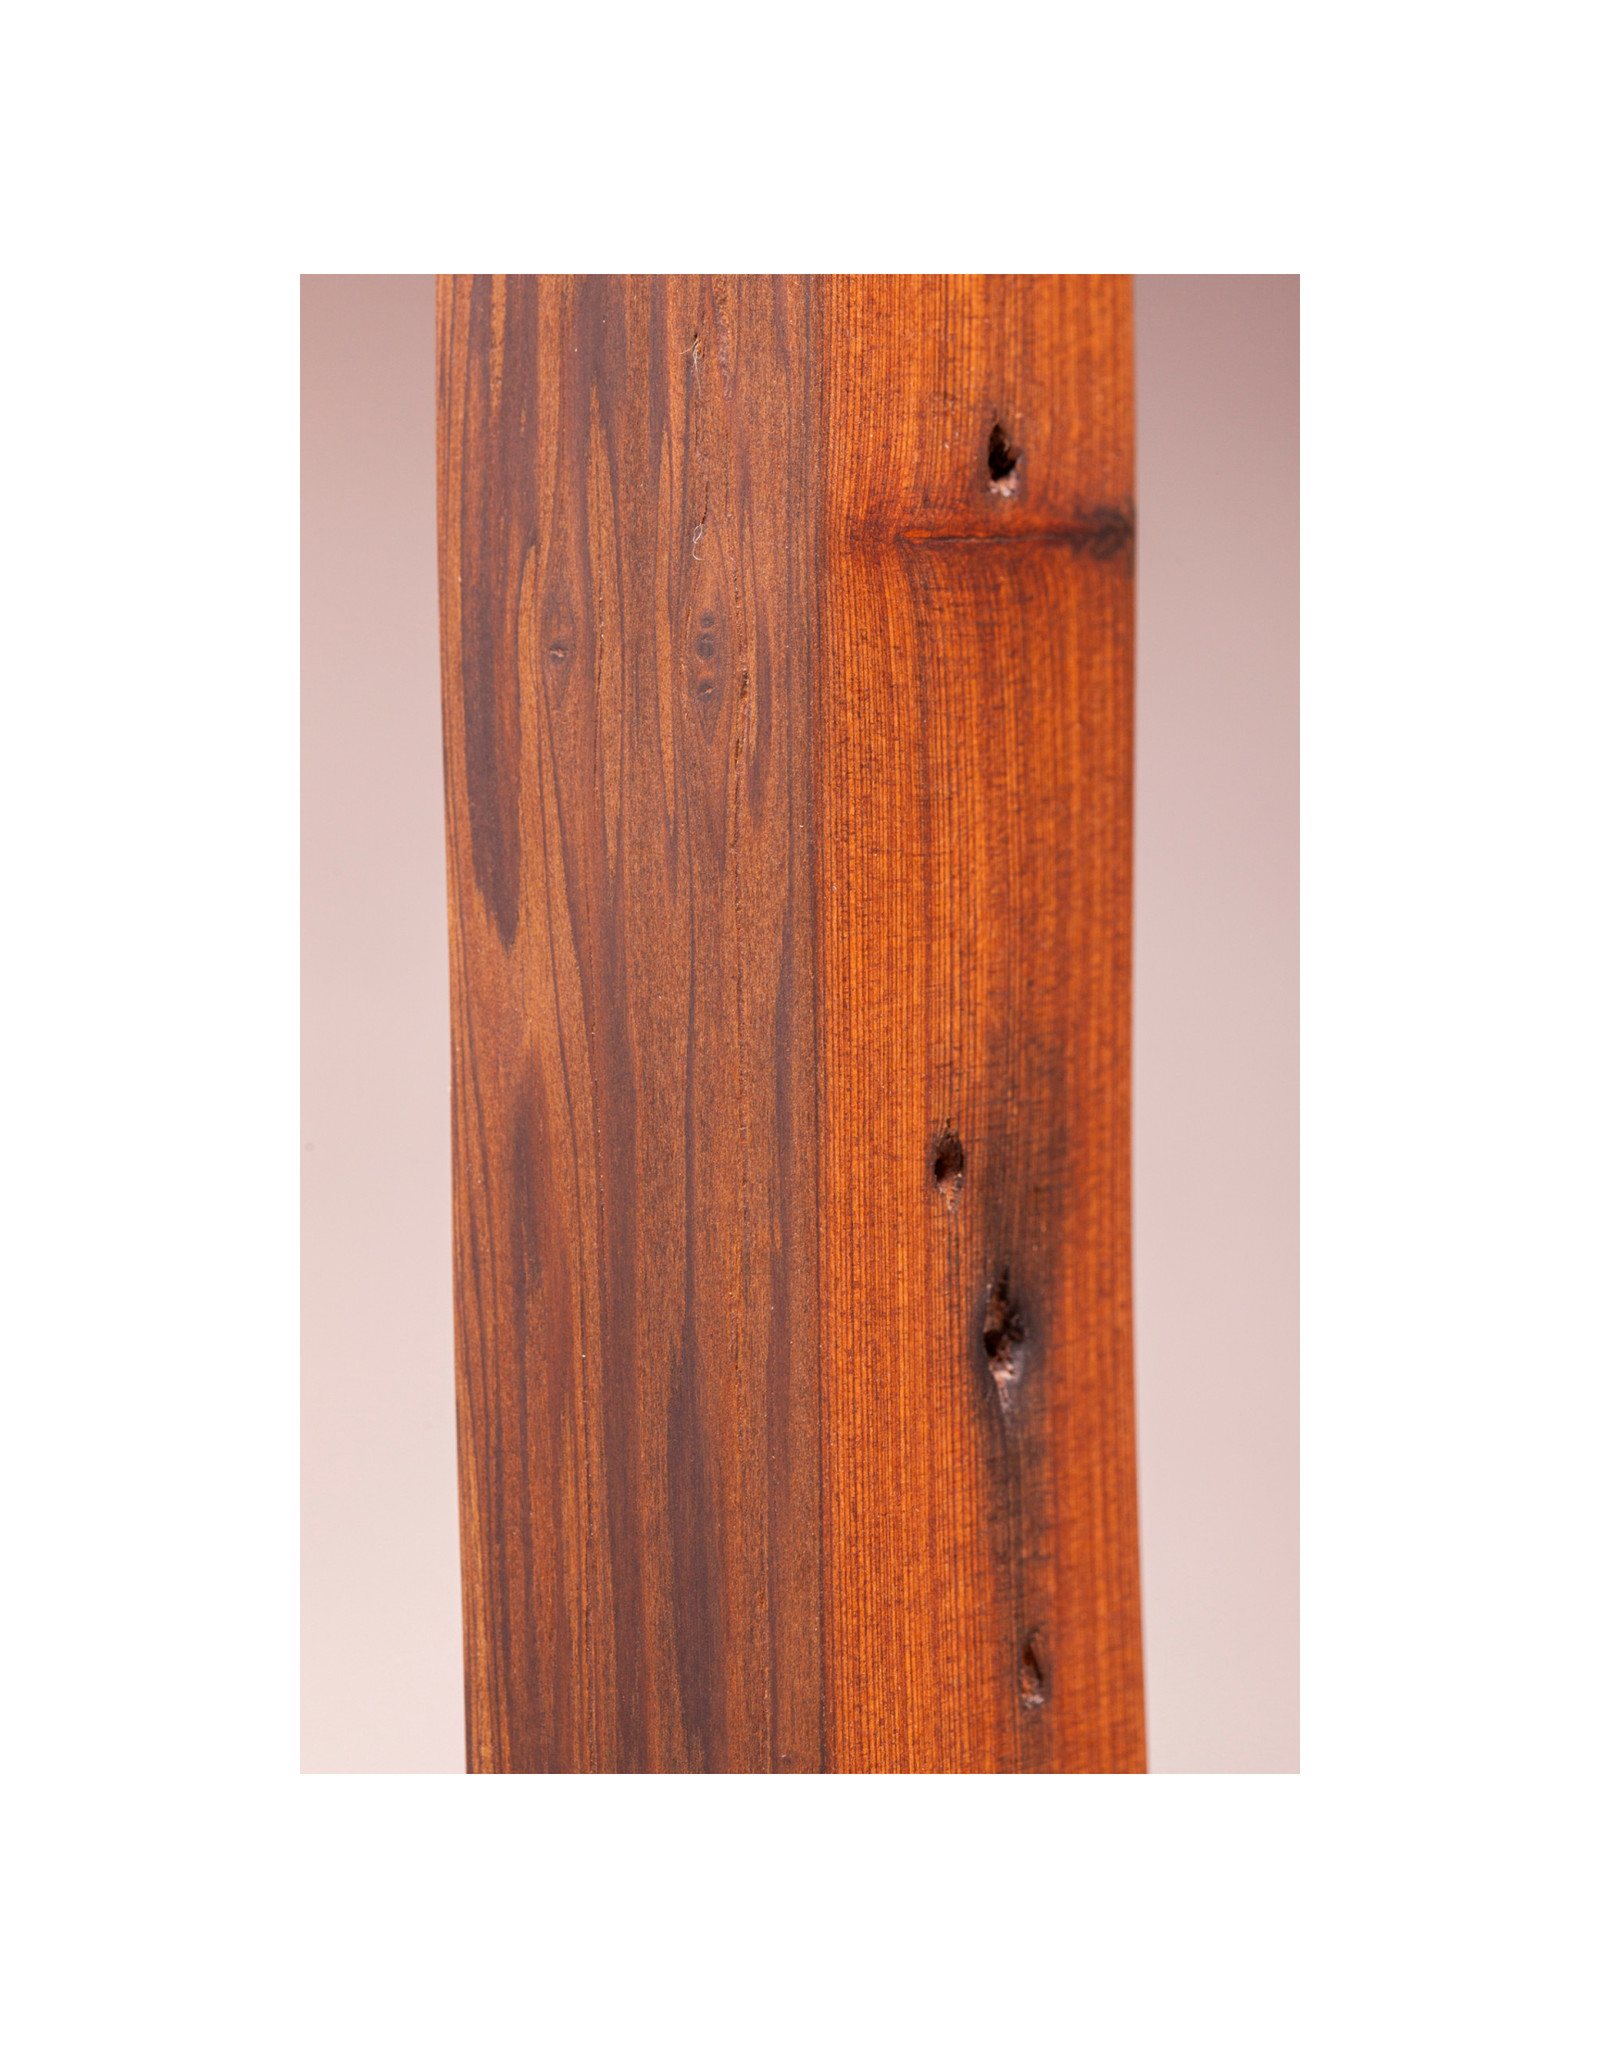 Ceremonial Redwood - No. 4